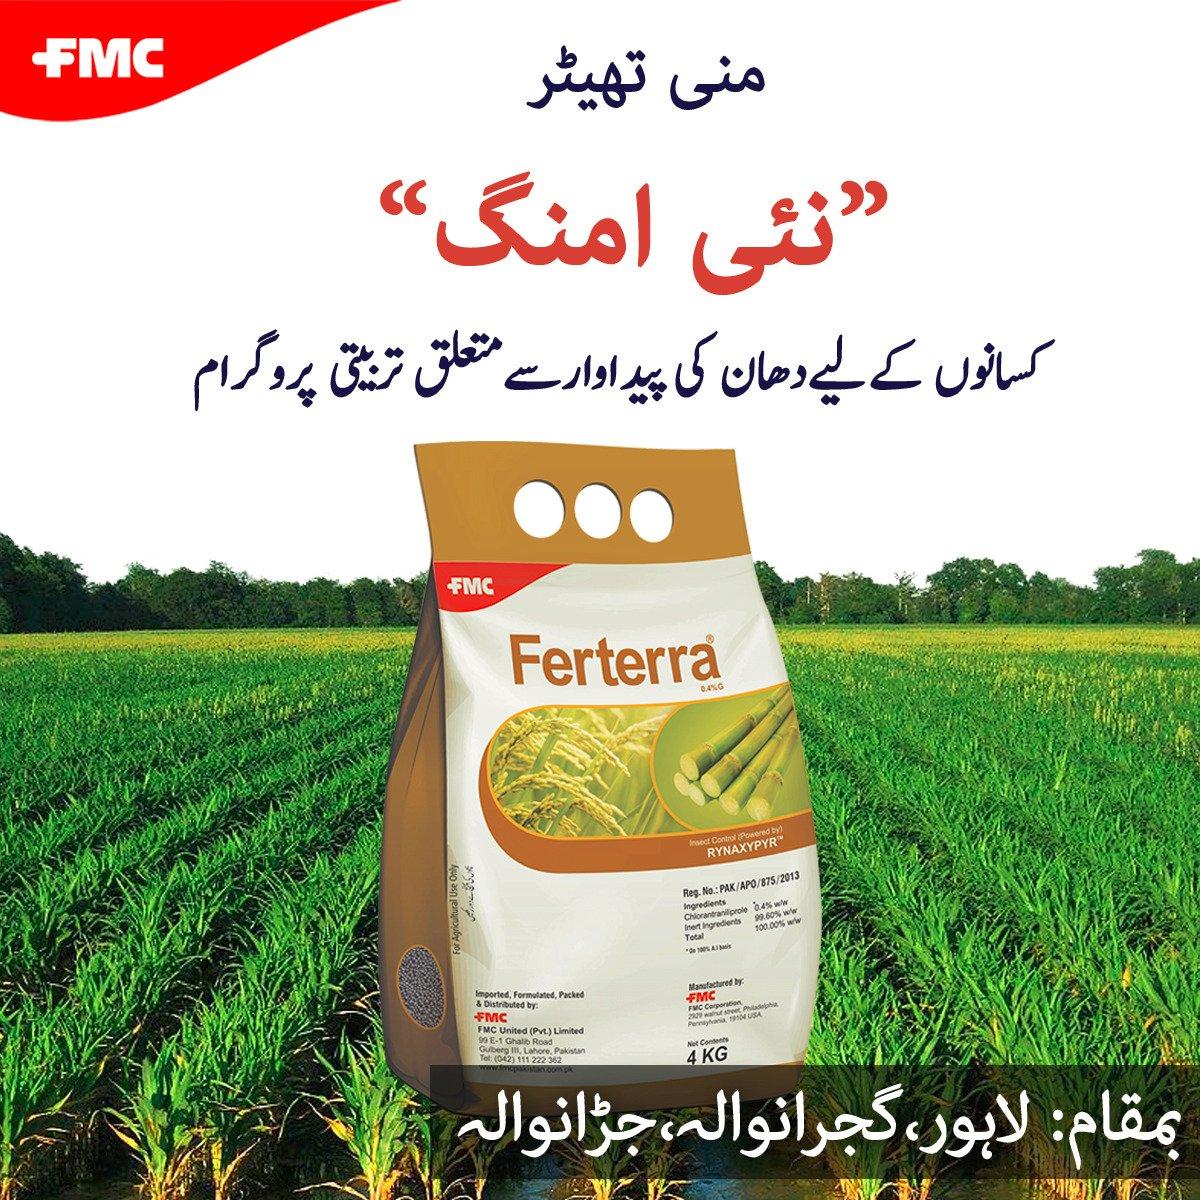 fmcagspakistan - FMCAGSPAKISTAN Twitter Profile   Twitock